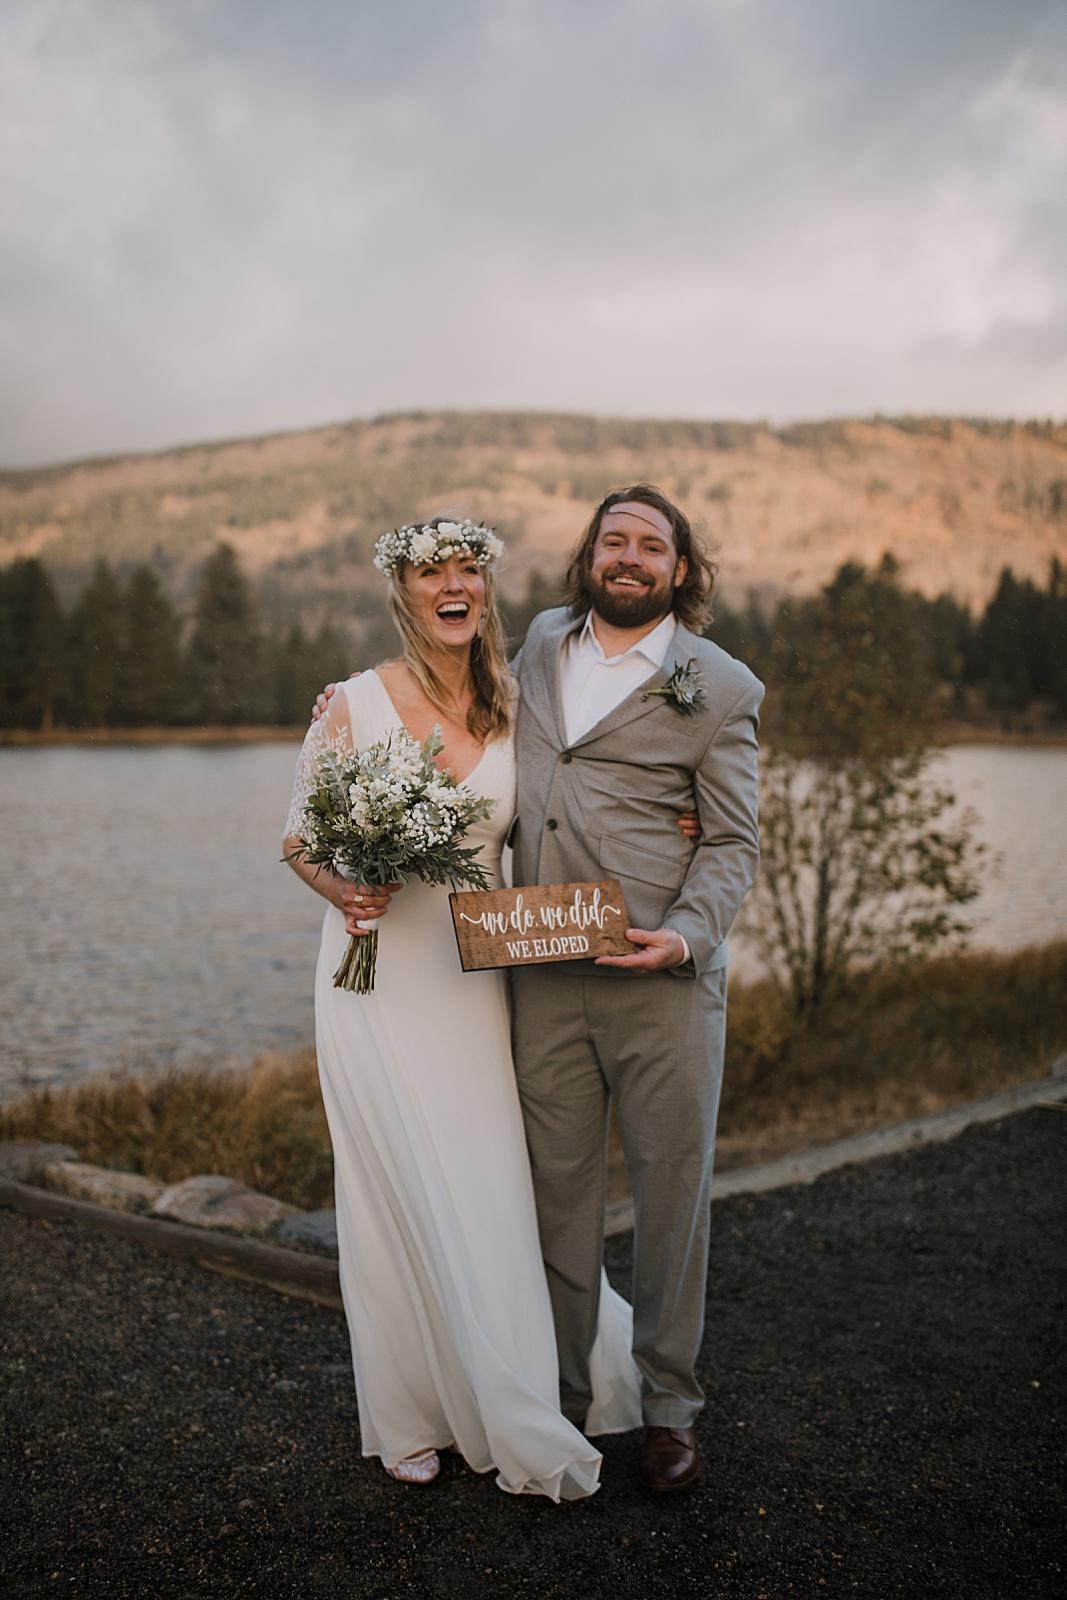 we eloped, sprague lake dock elopement, sunrise elopement, colorado elopement, sprague lake elopement, rocky mountain national park elopement, adventurous colorado hiking elopement